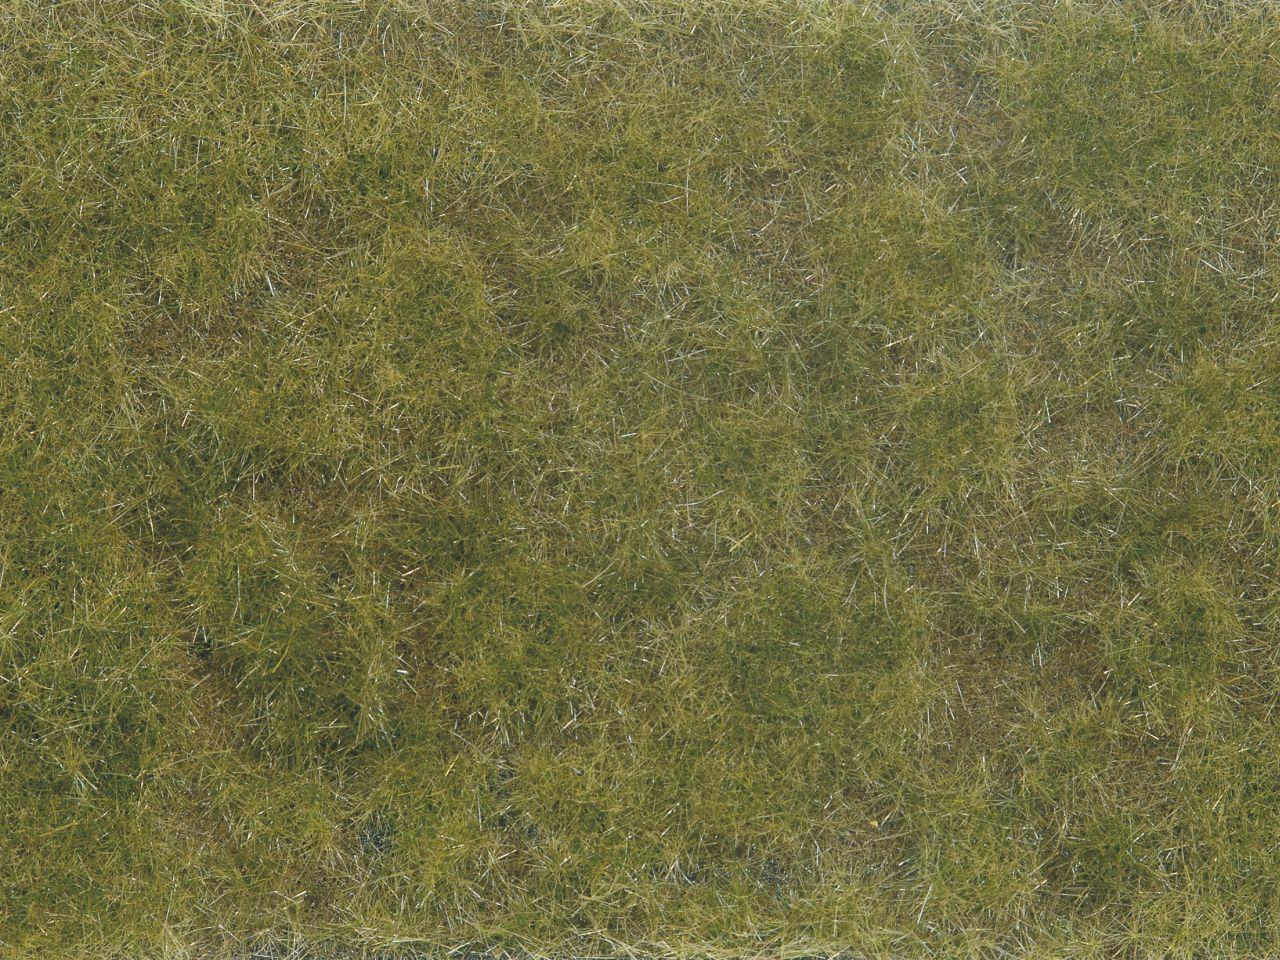 Bodend.-Foliage grün/braun